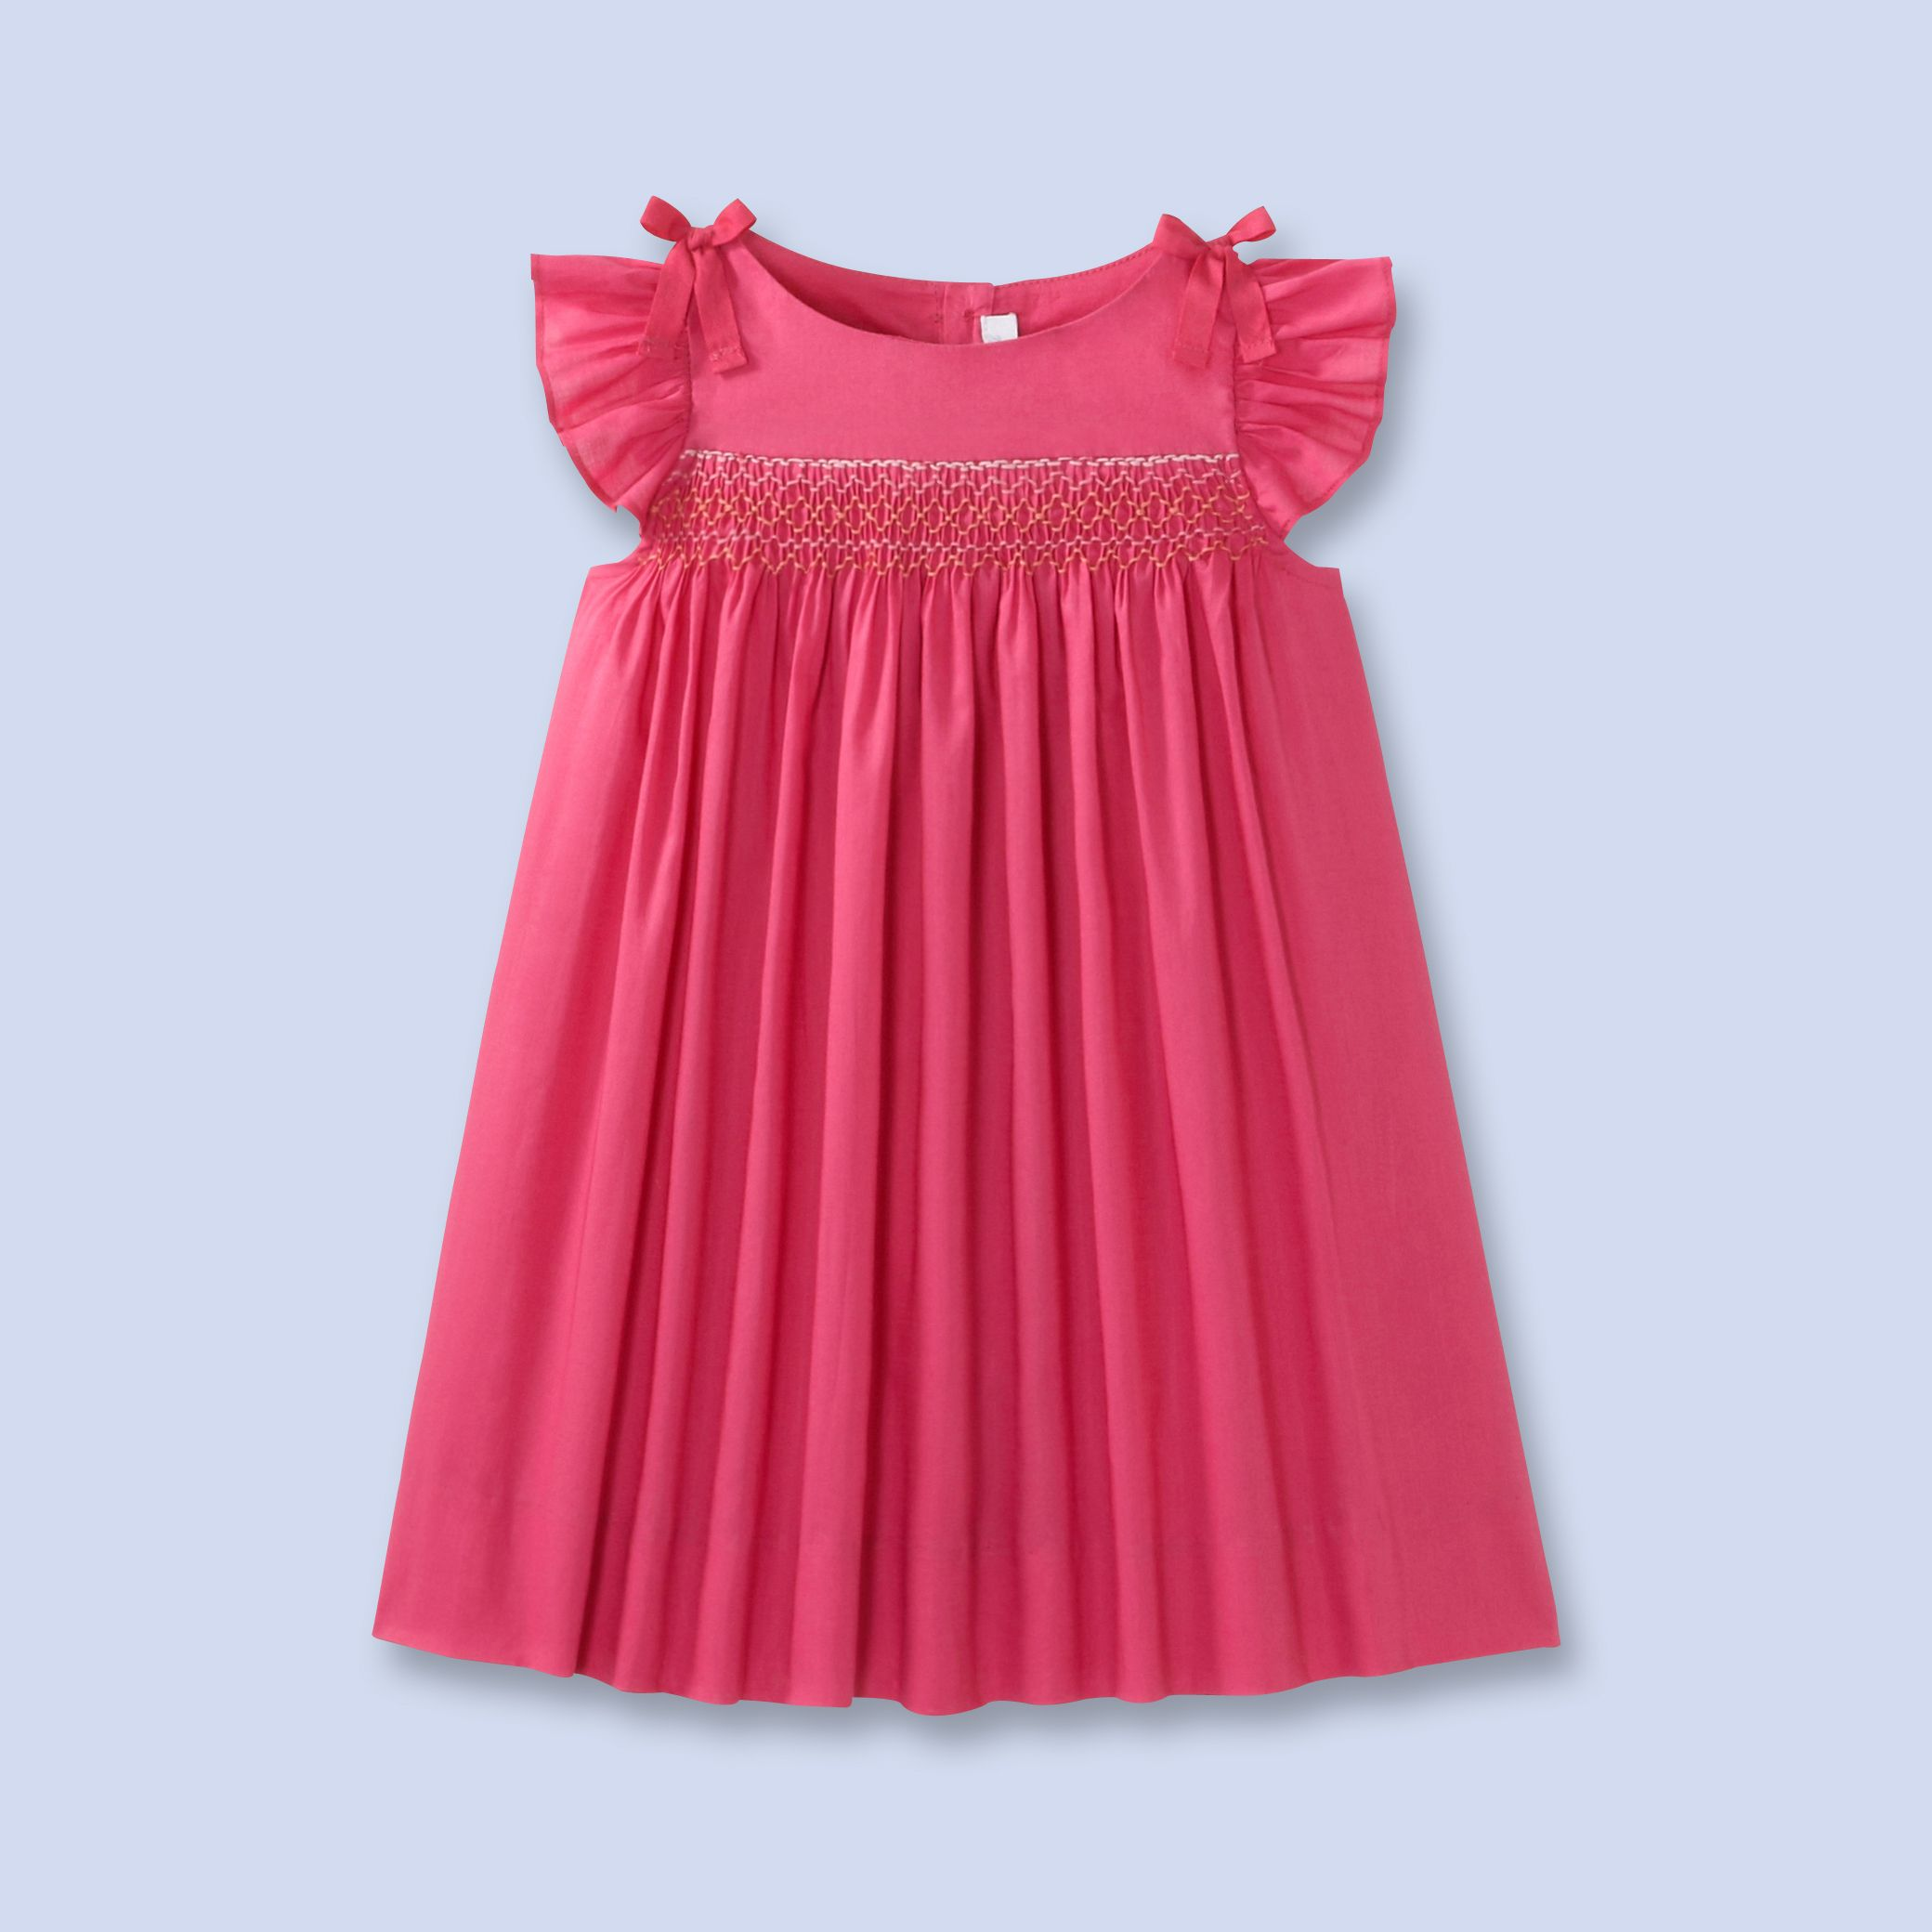 Hand smocked dress for baby girl Smocking Ideas